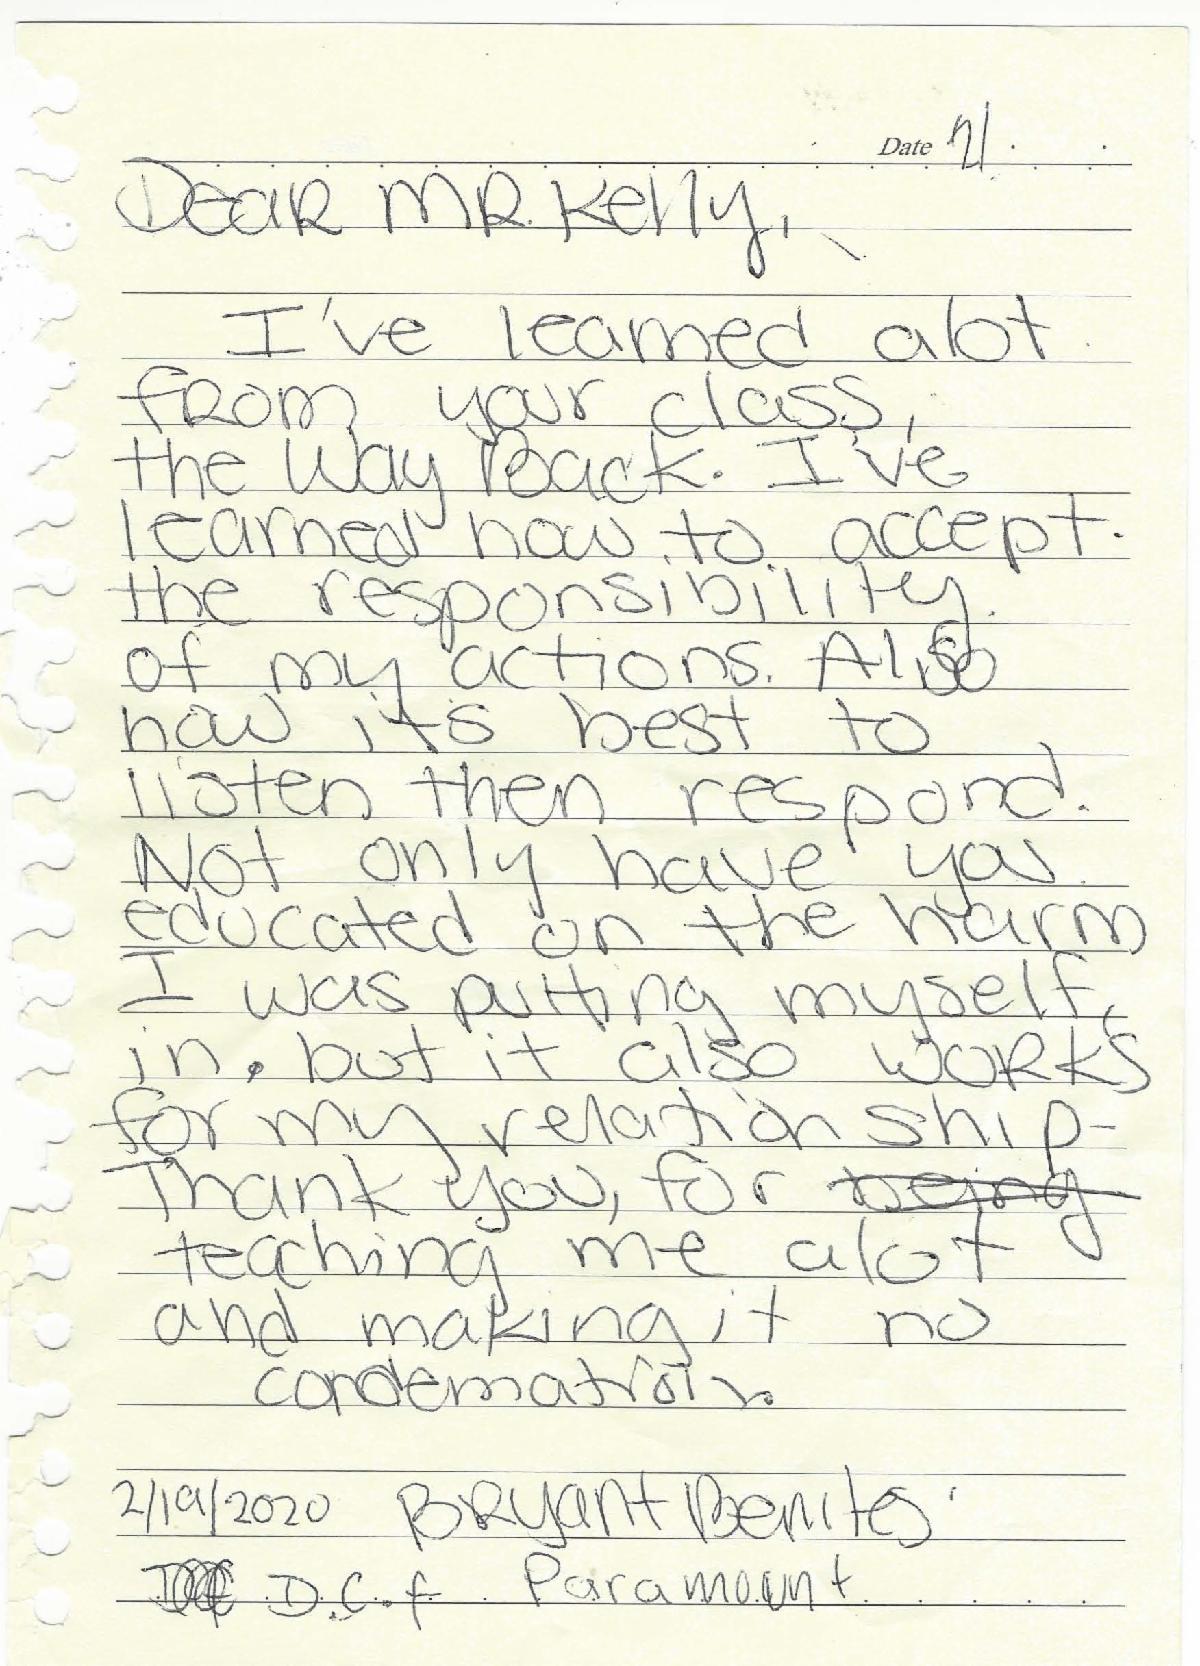 handwritten testimonial from child